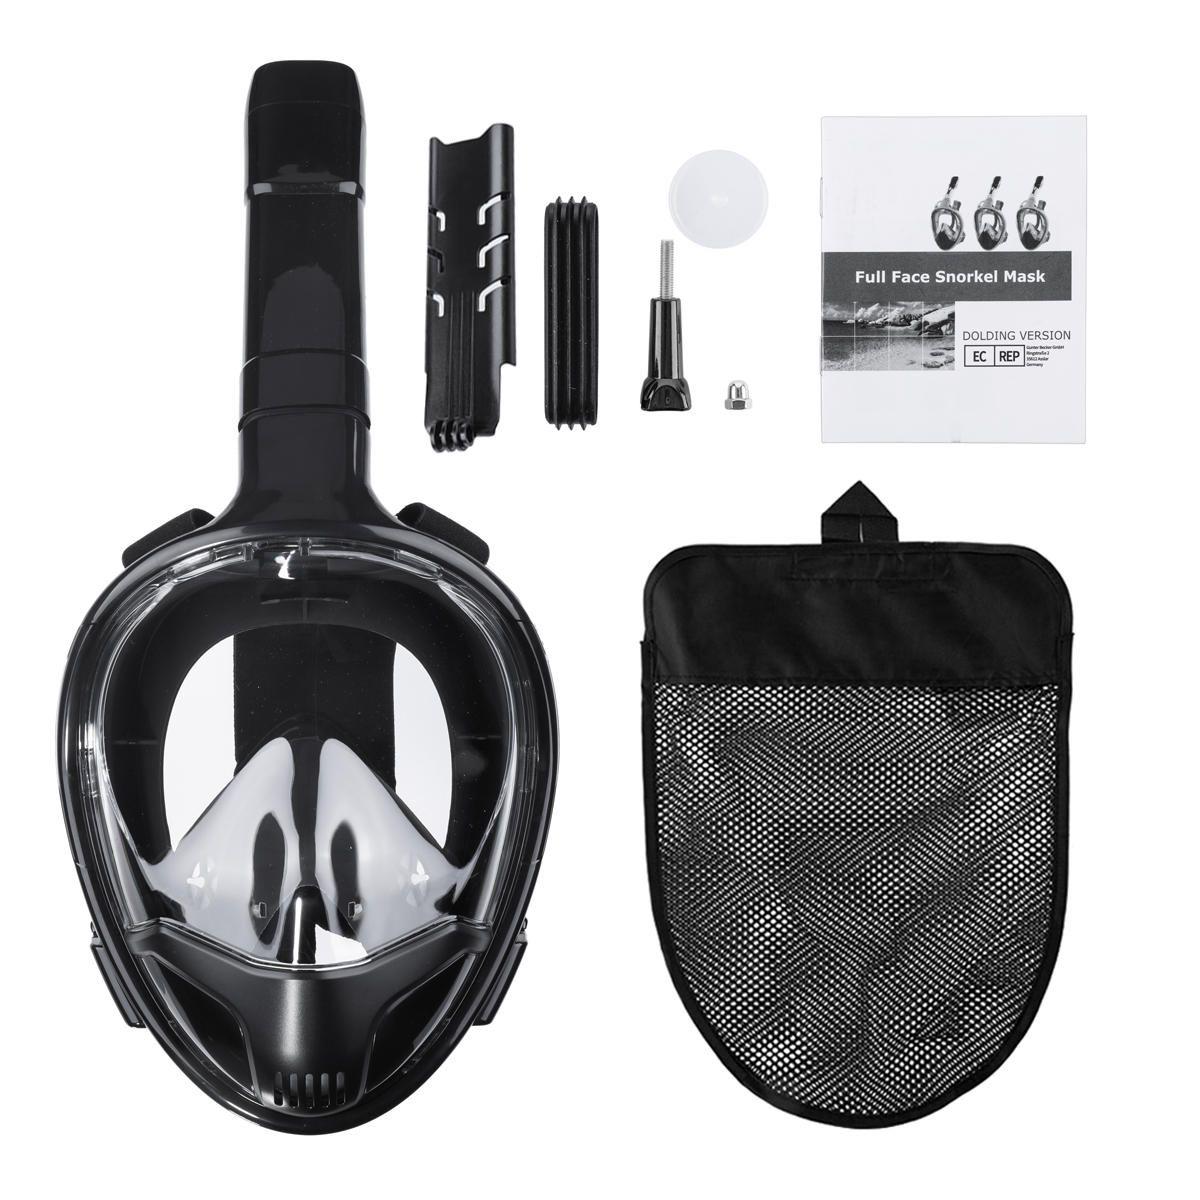 CAMTOA Diving Goggles Mask 180° Full Dry Coverage Respirator Mask Double Tube Anti fog Swimming Protector